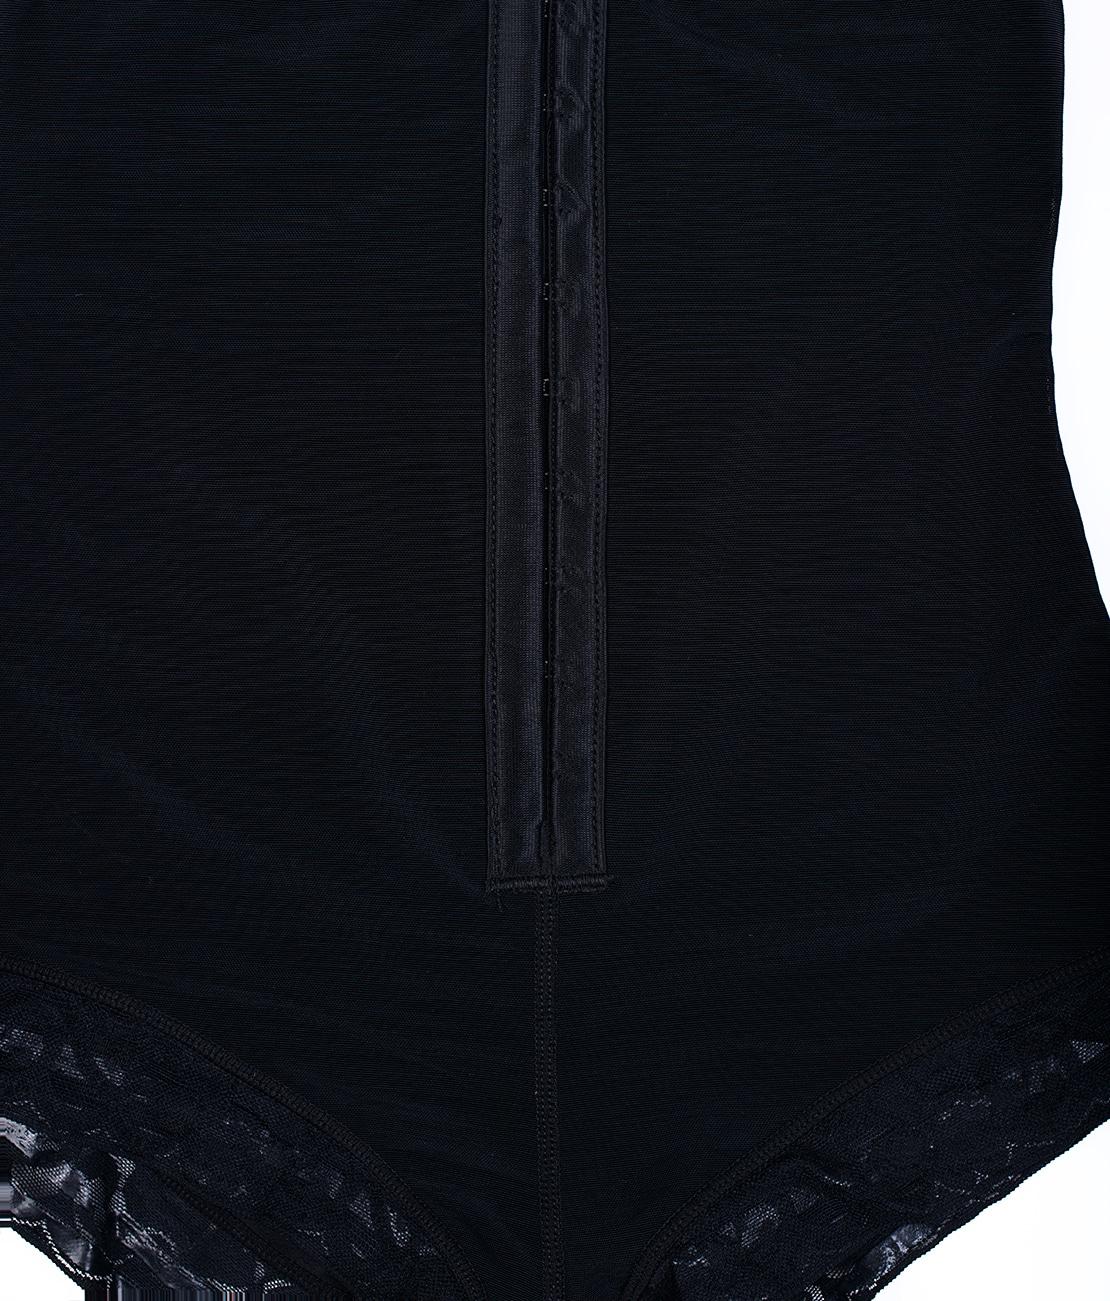 Combinaison Gainante Dentelle Noire Packshot Detail 1